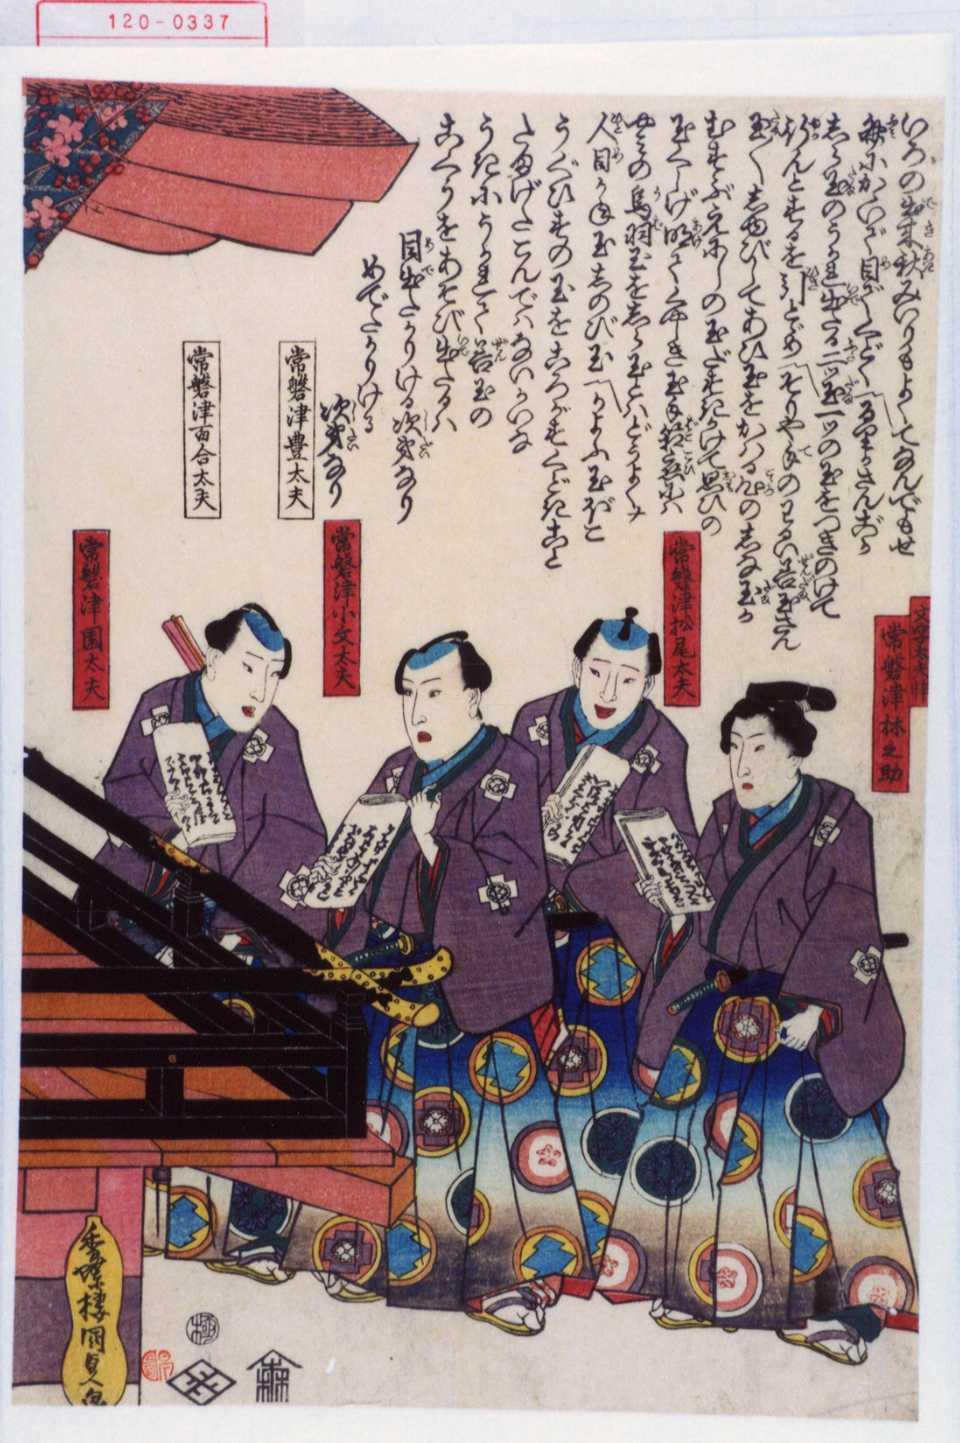 Utagawa Kunisada: 「文字太夫忰 常磐津林之助」「常磐津松尾太夫 ...